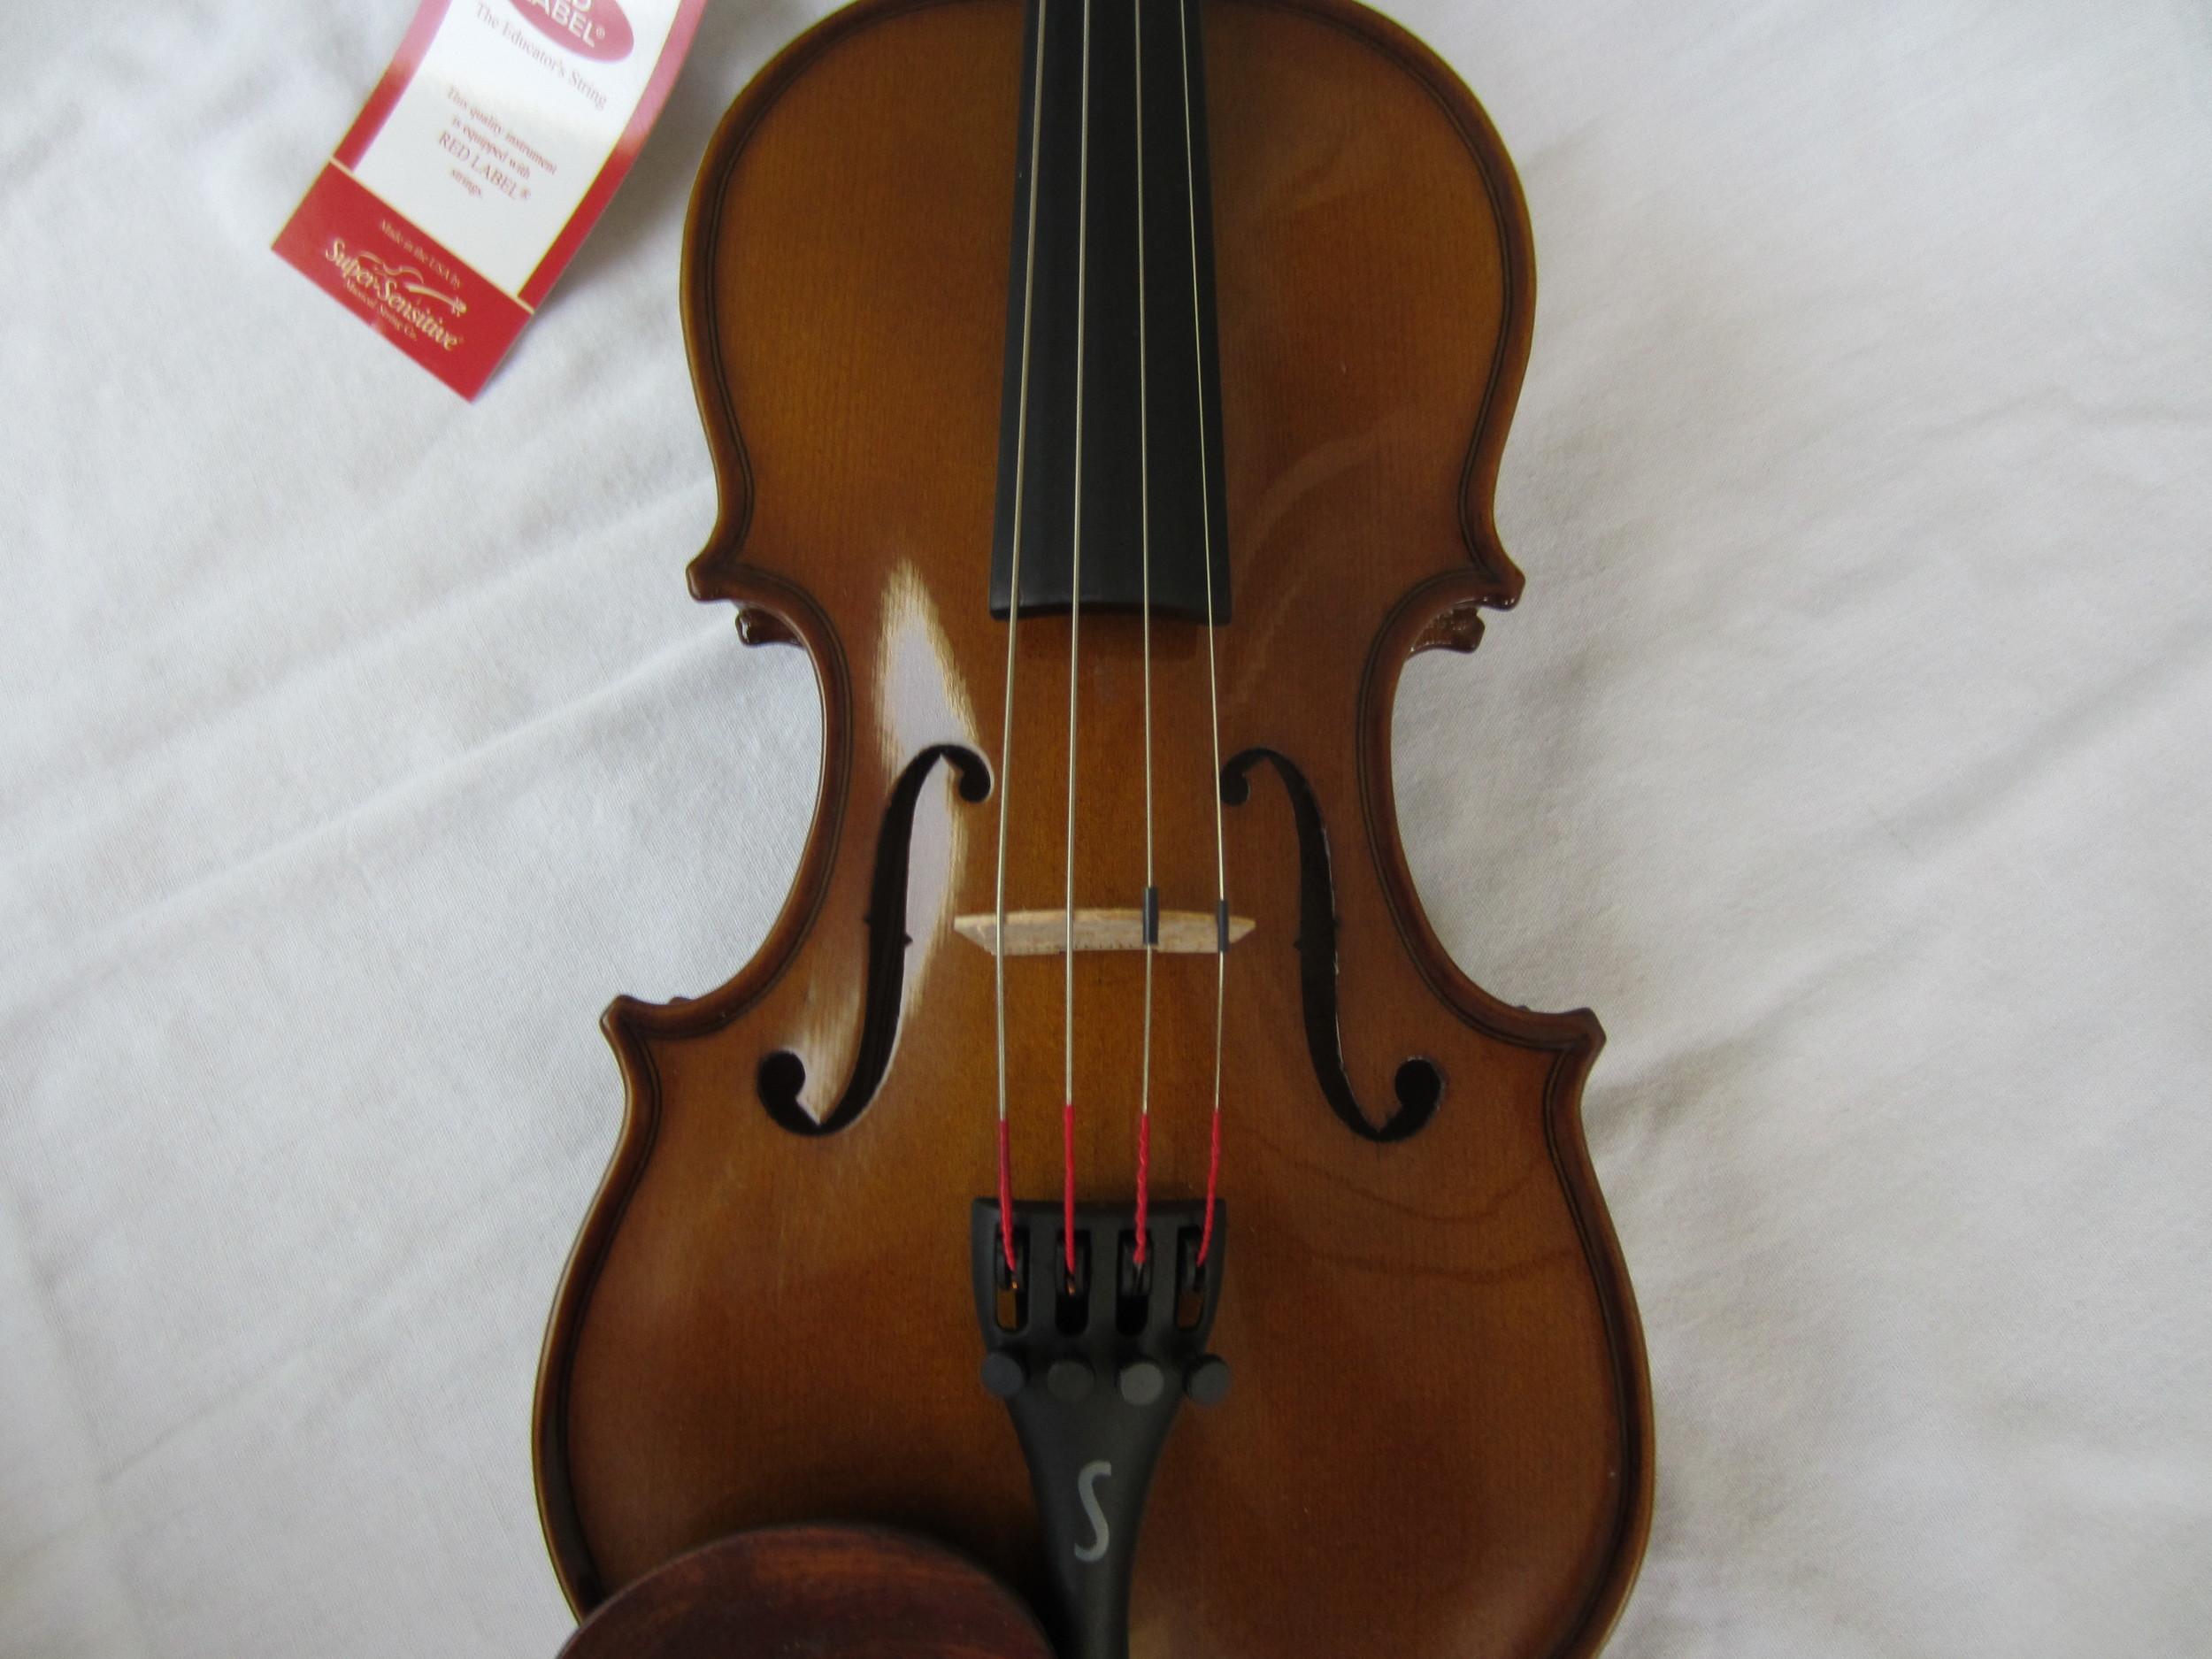 Stentor Violin 1400 Review